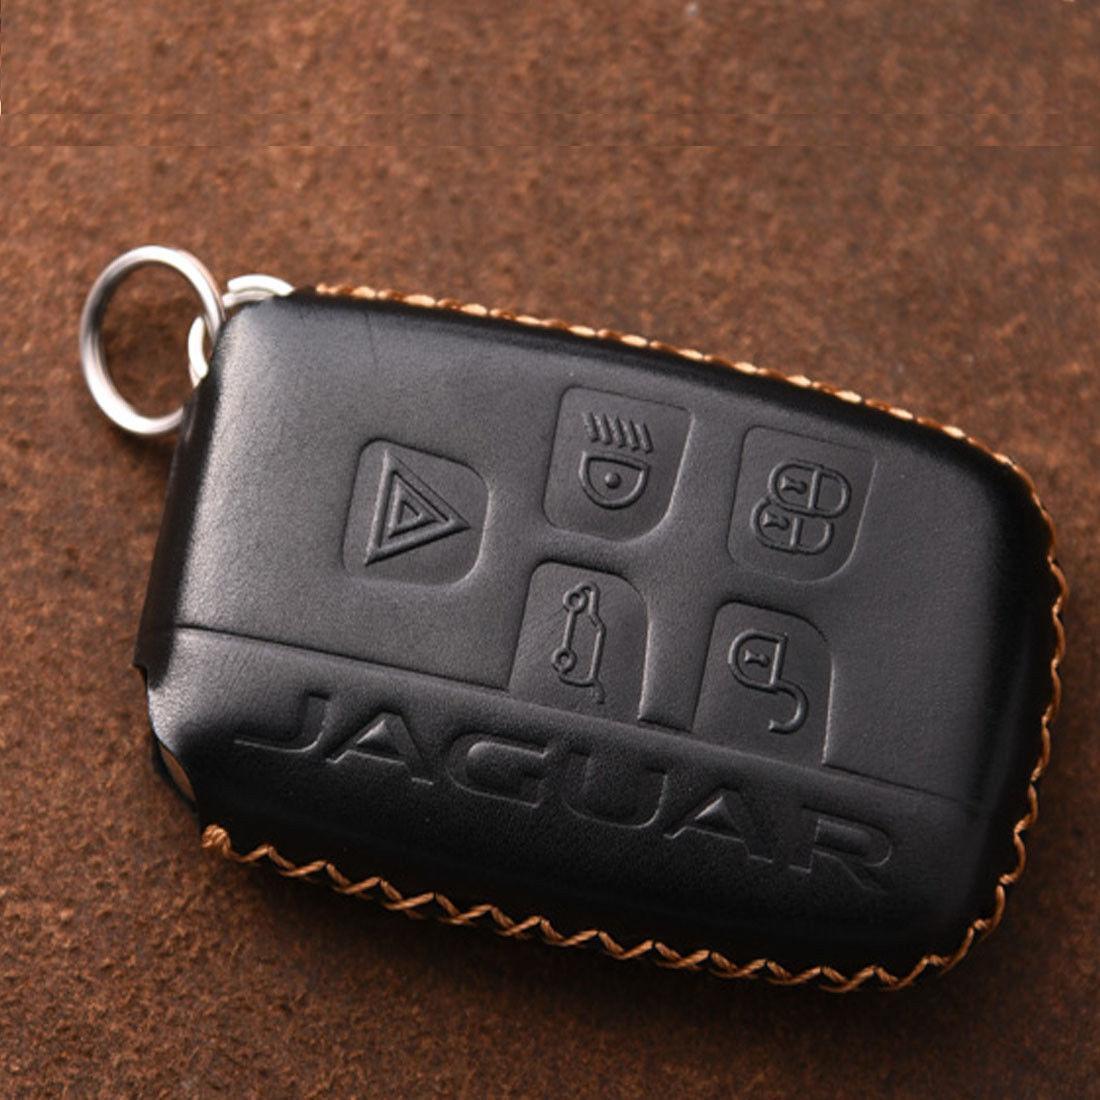 Кожаный чехол для ключа Jaguar E-Pace,F-Pace,F-Type,I-Pace,XE, XF,XFR,XFR-S,XJ,XK,XKR,XKR-S,X-TYPE